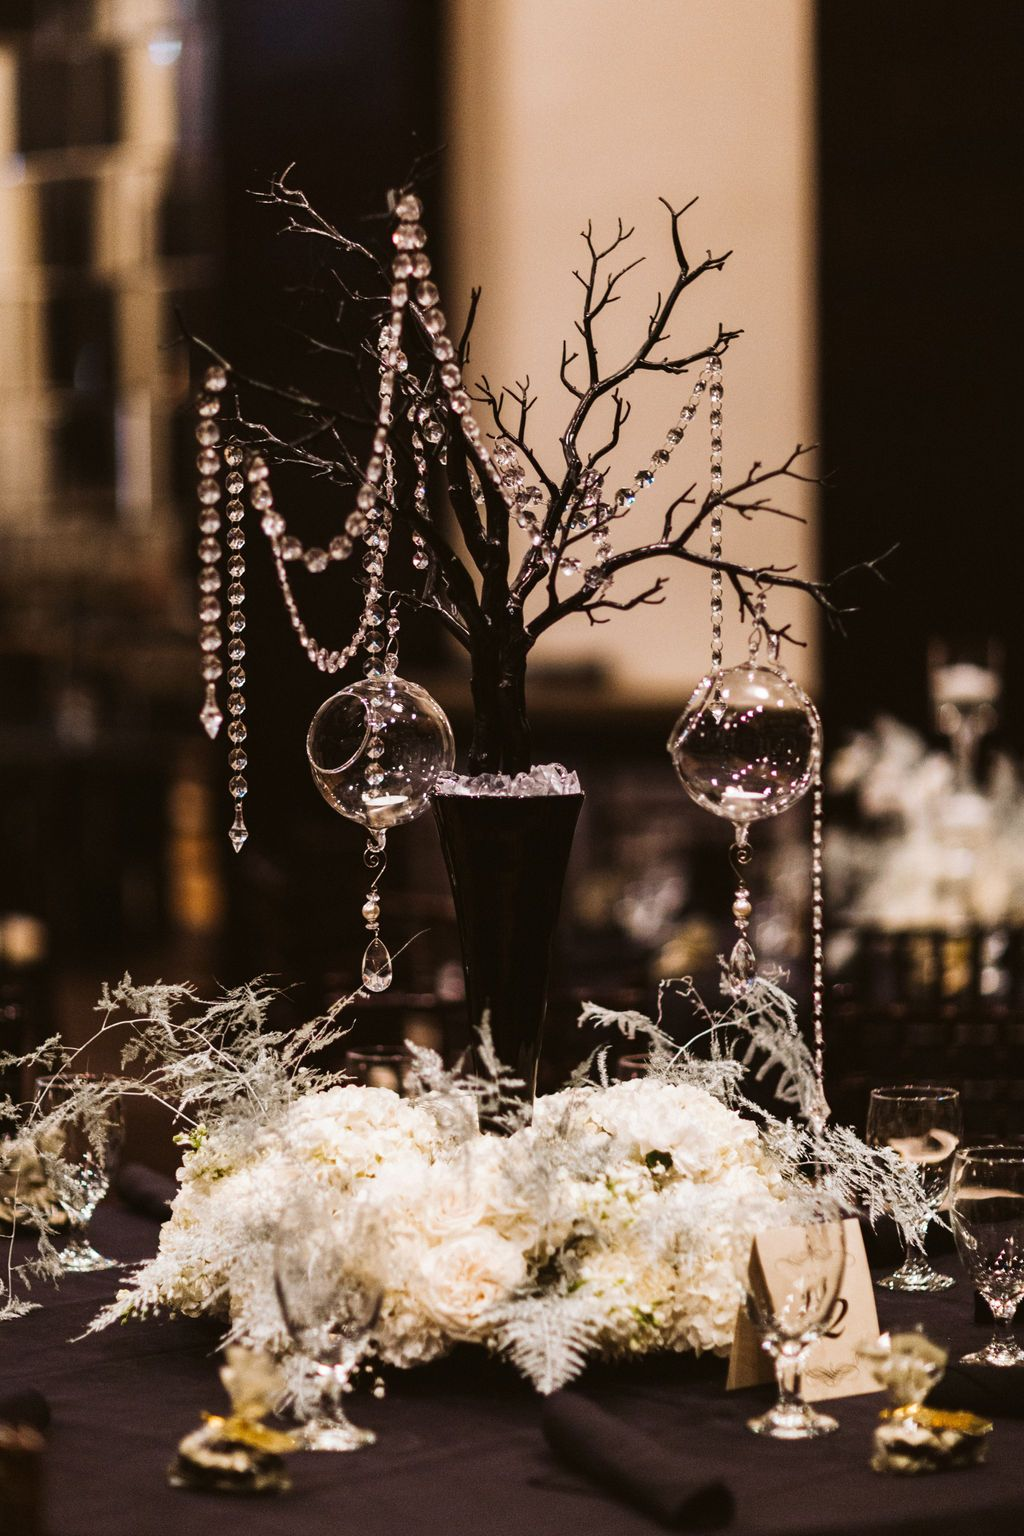 wedding centerpiece (With images) Unique wedding venues